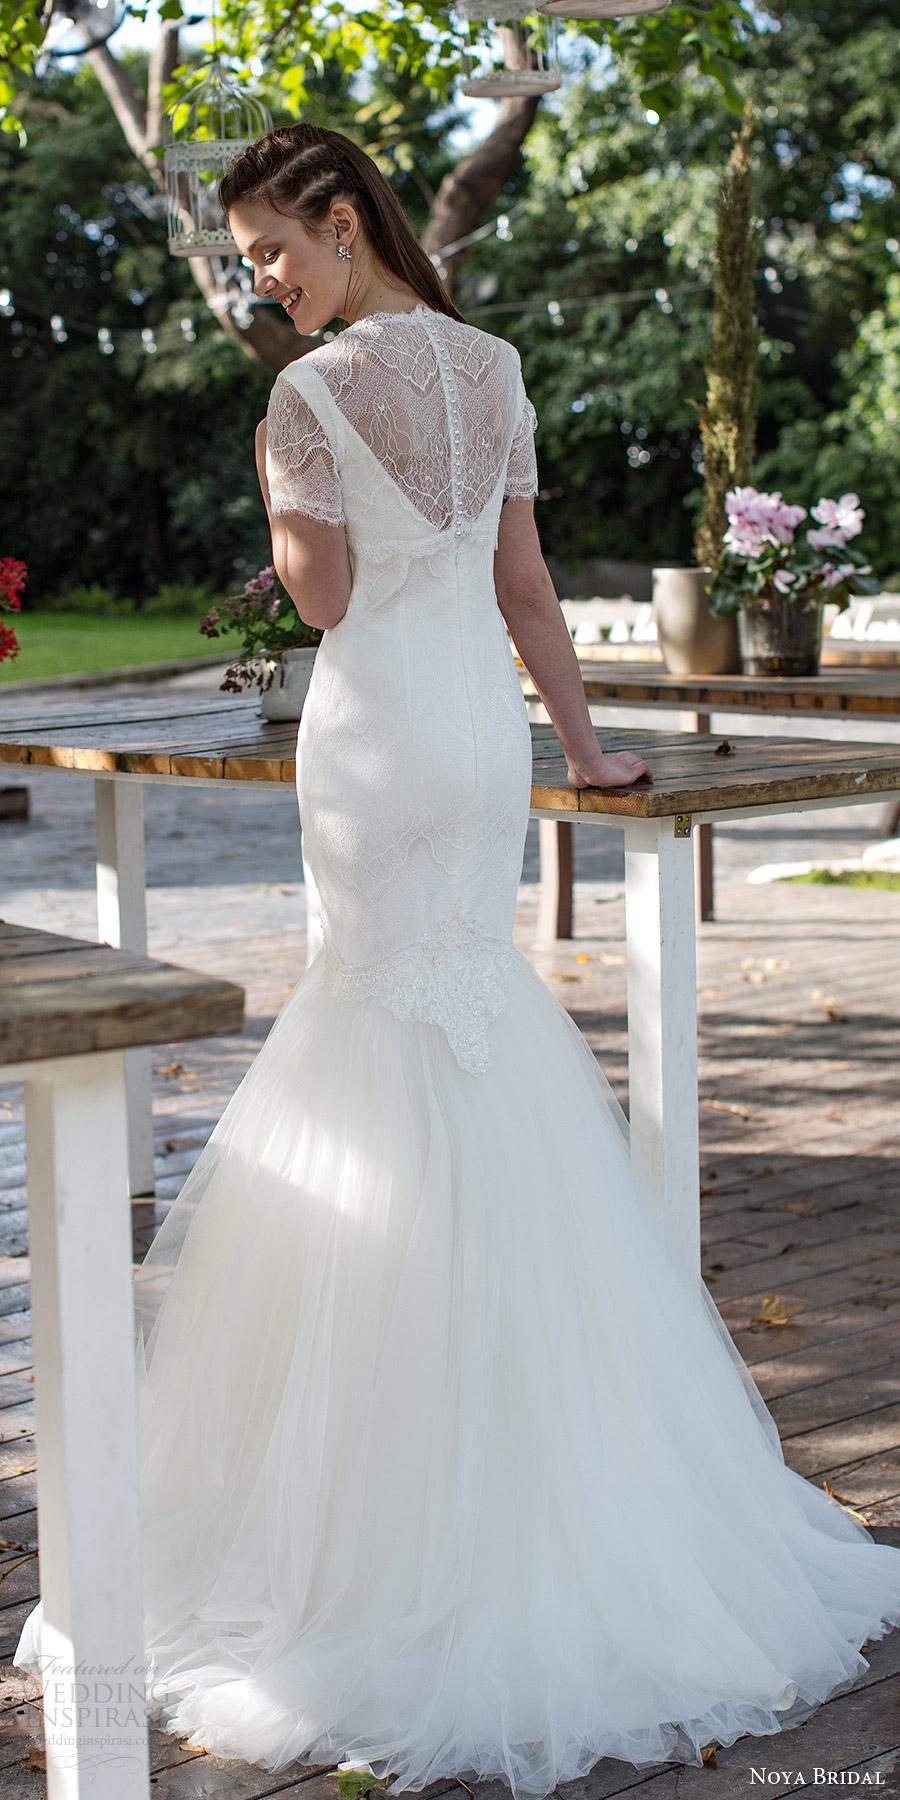 noya bridal 2016 sleeveless v neck illusion jewel lace mermaid fit flare wedding dress (1211) bv romantic shortsleeve top